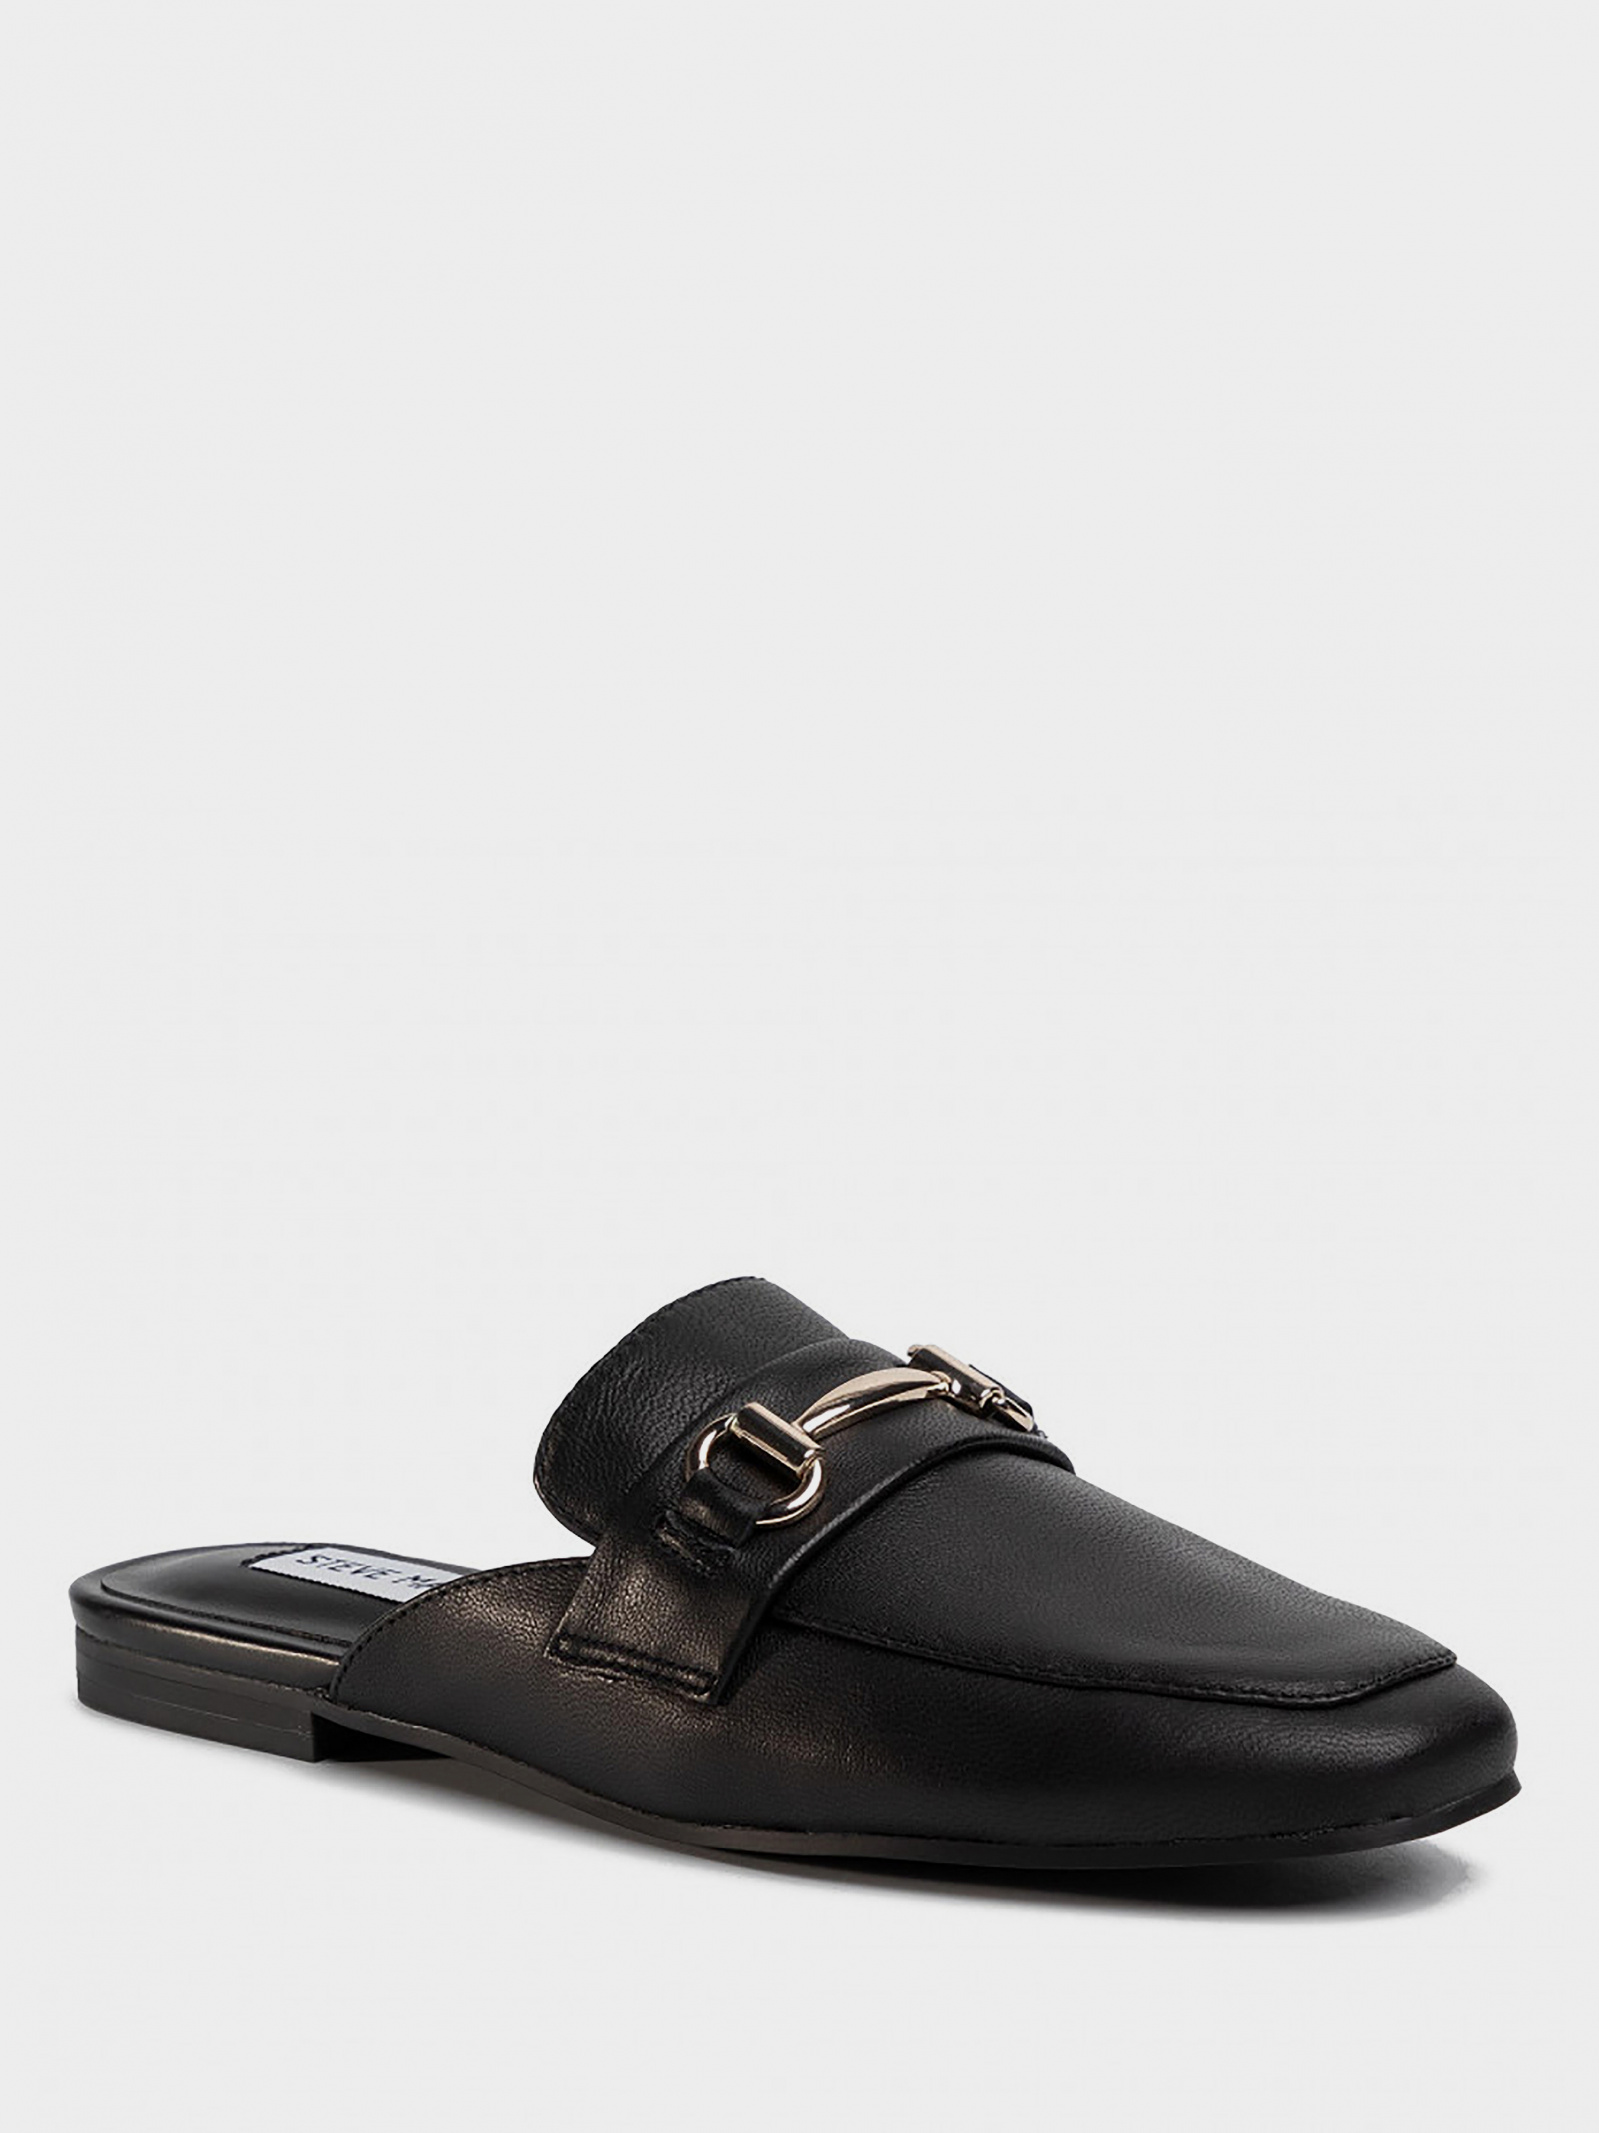 Шльопанці  жіночі Steve Madden SM11000935 BLACK LEATHER розмірна сітка взуття, 2017